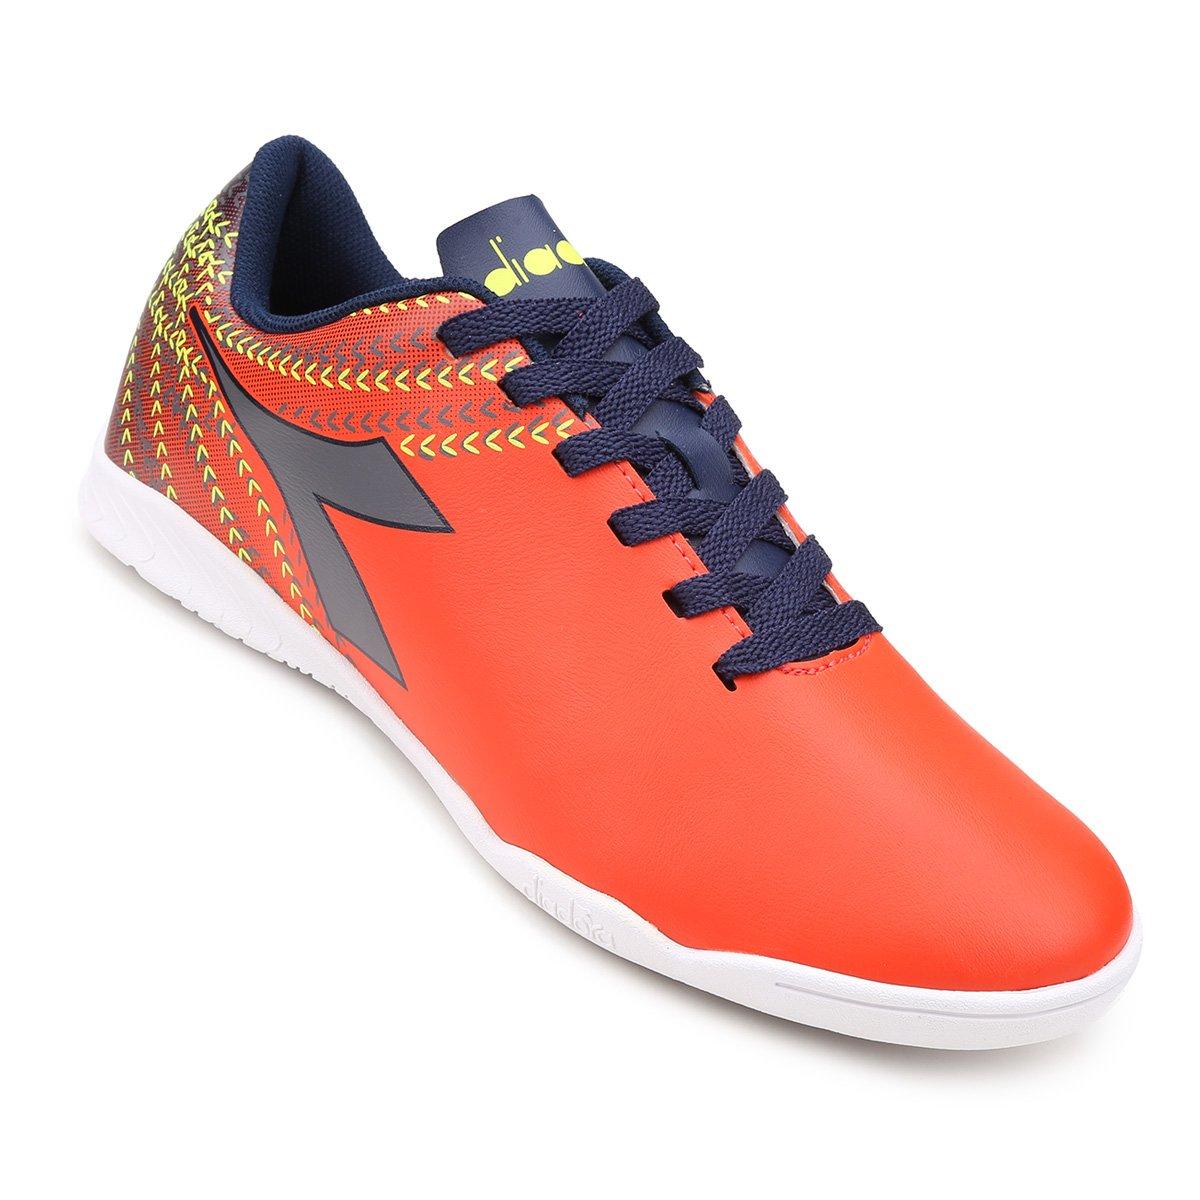 daba7d3642276 Chuteira Futsal Diadora Track - Laranja e Azul - Compre Agora